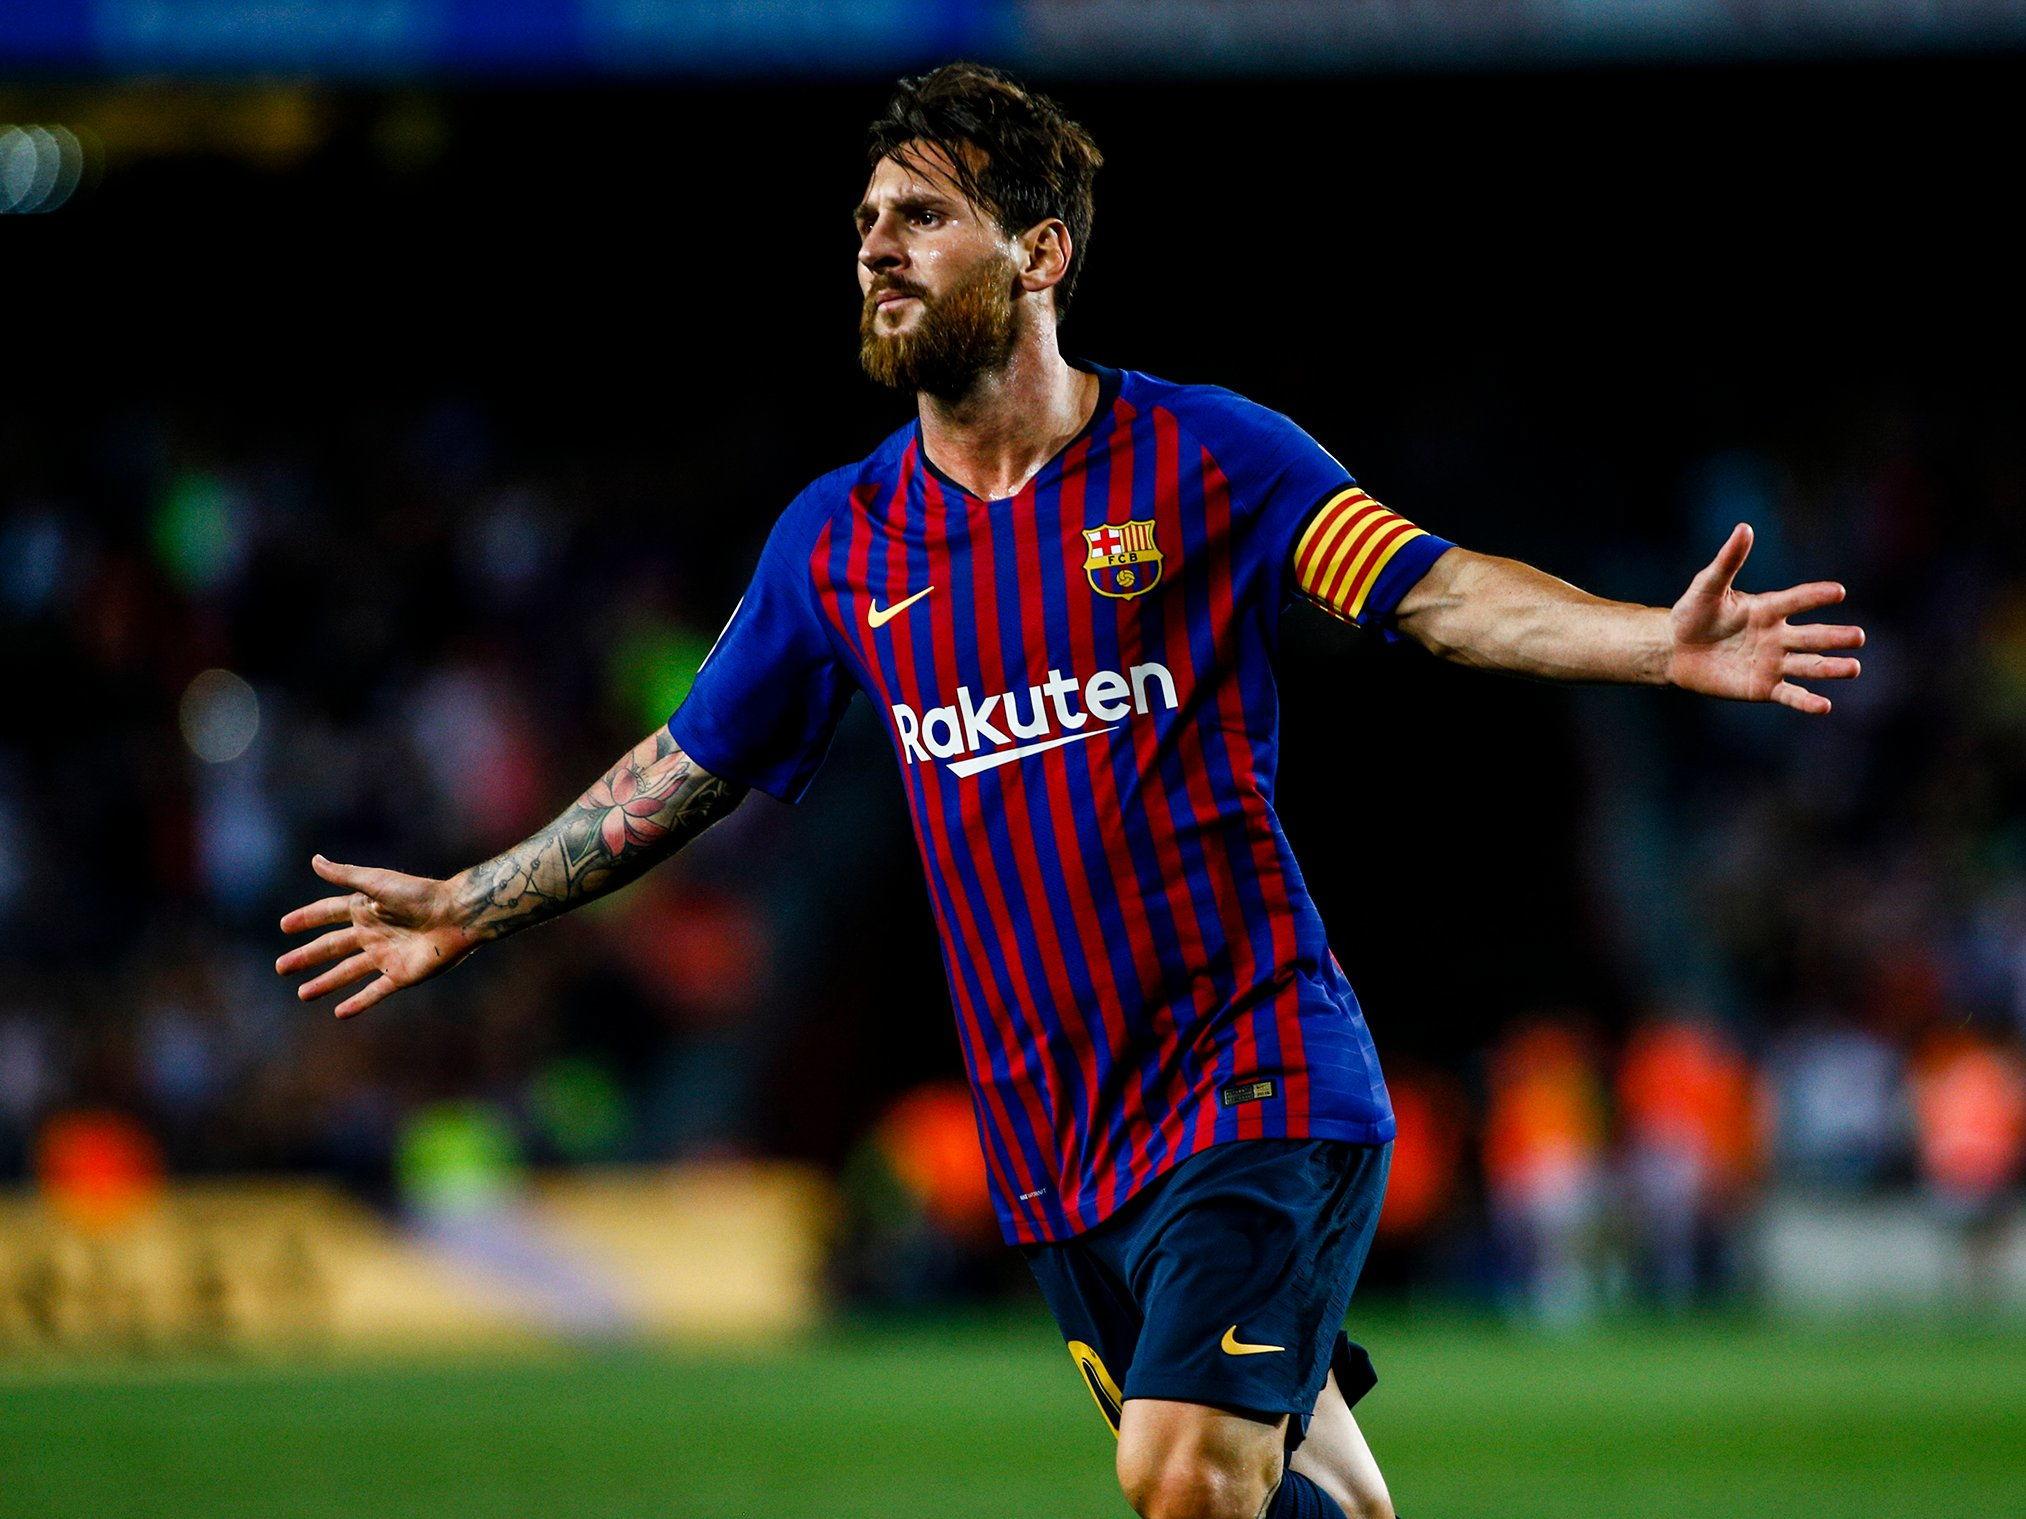 Zico : Messi Seperti Maradona Namun Pele Yang Terhebat